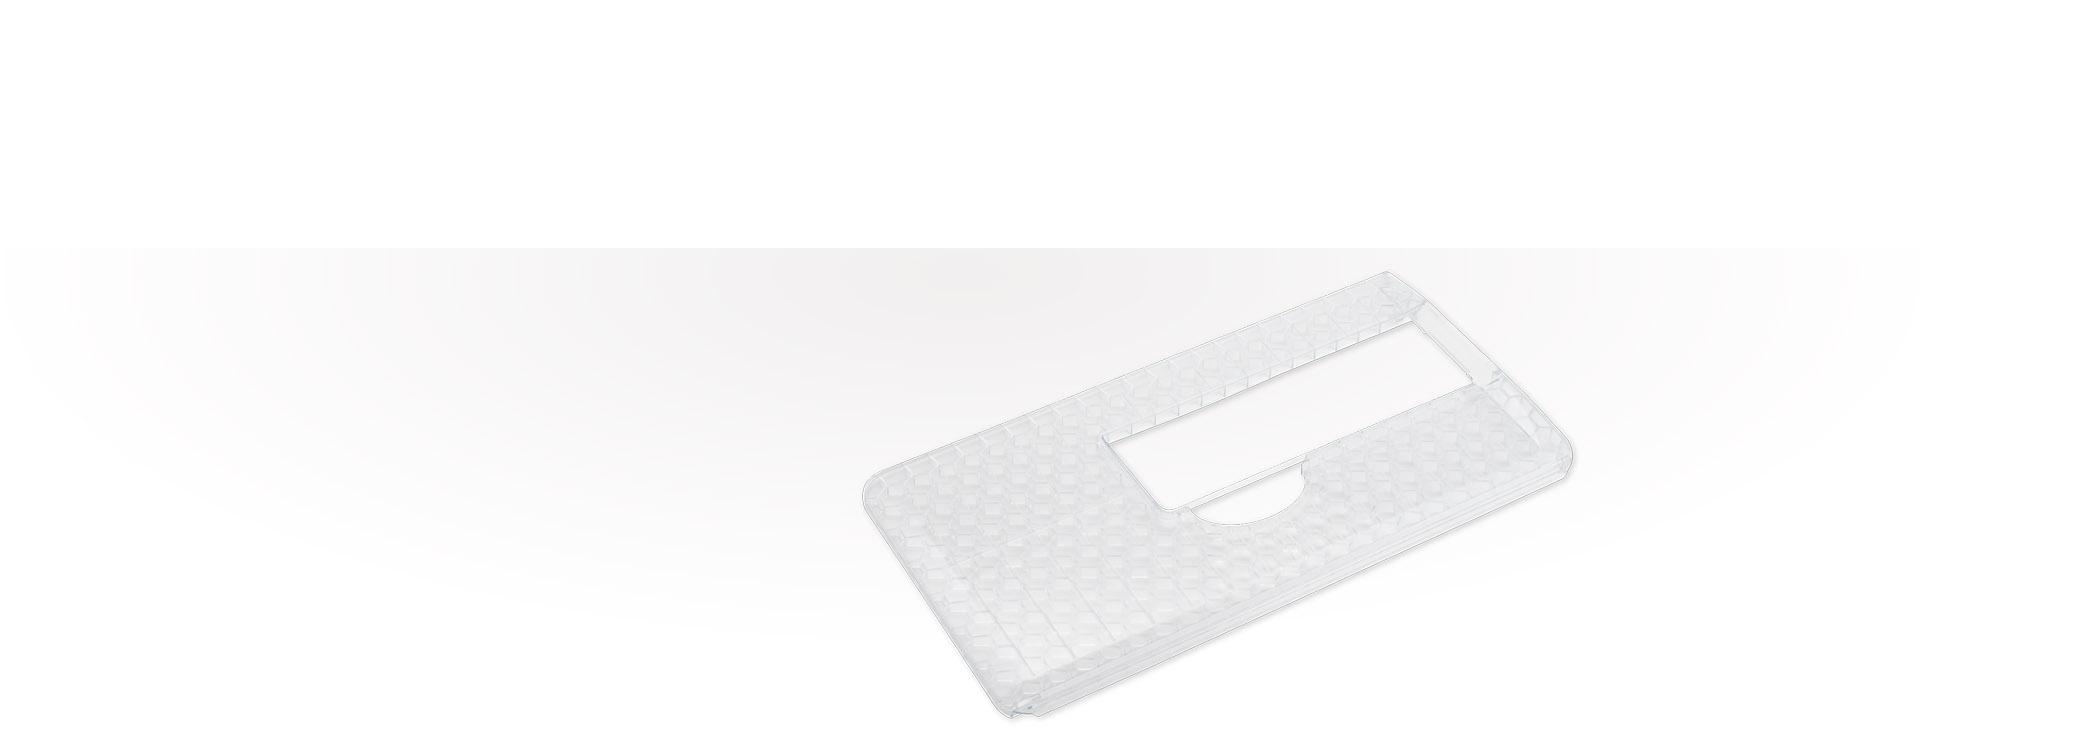 Plexiglass Table for 4 Series